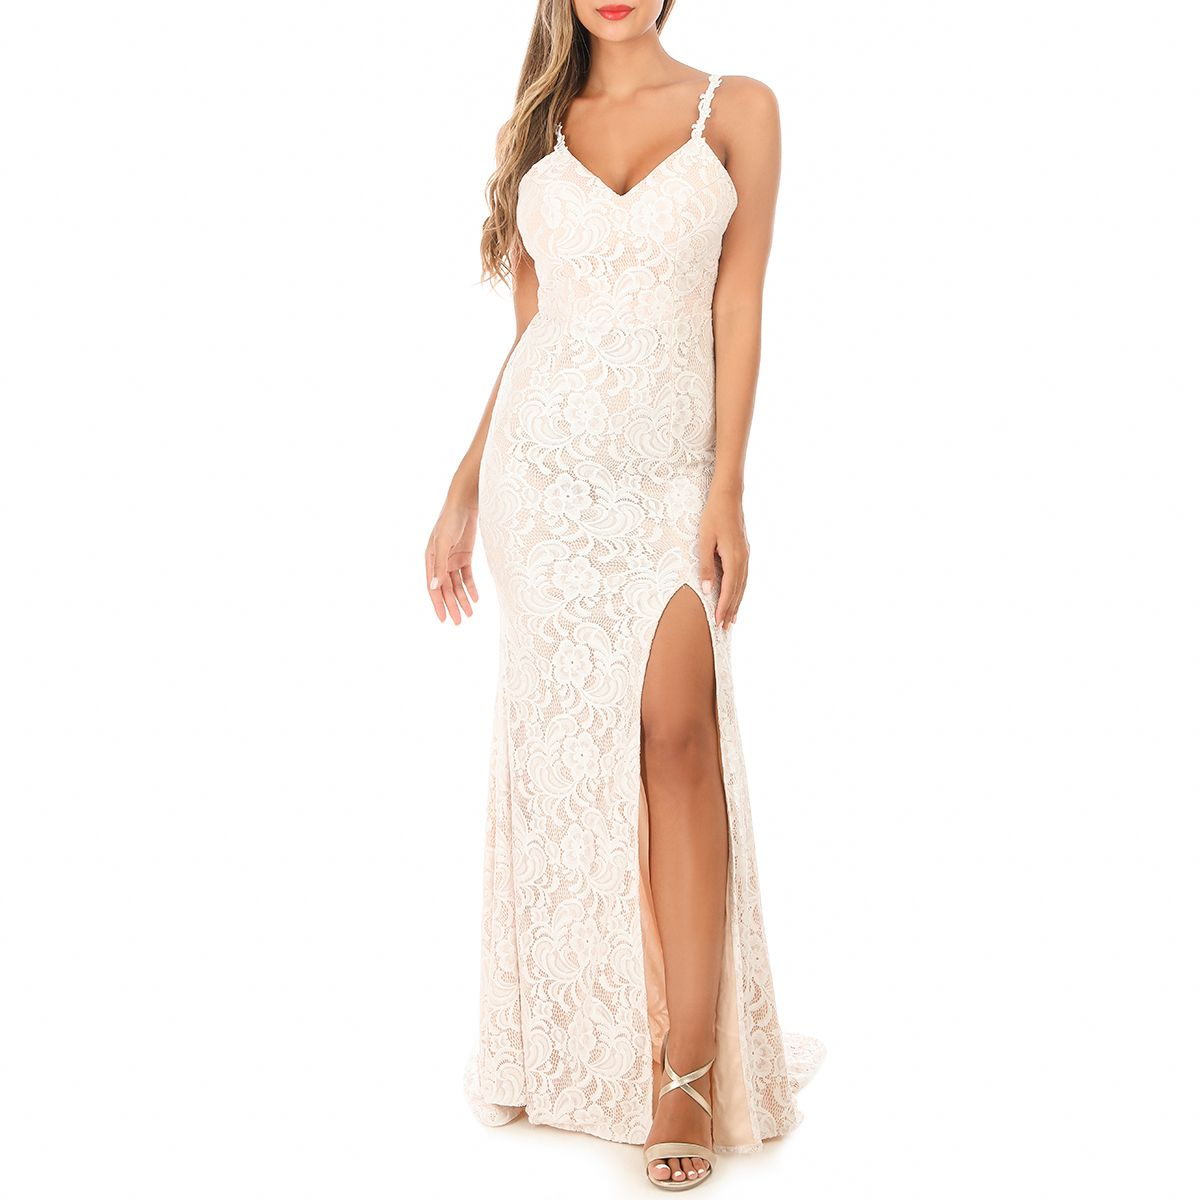 Robe blanche longue fendue